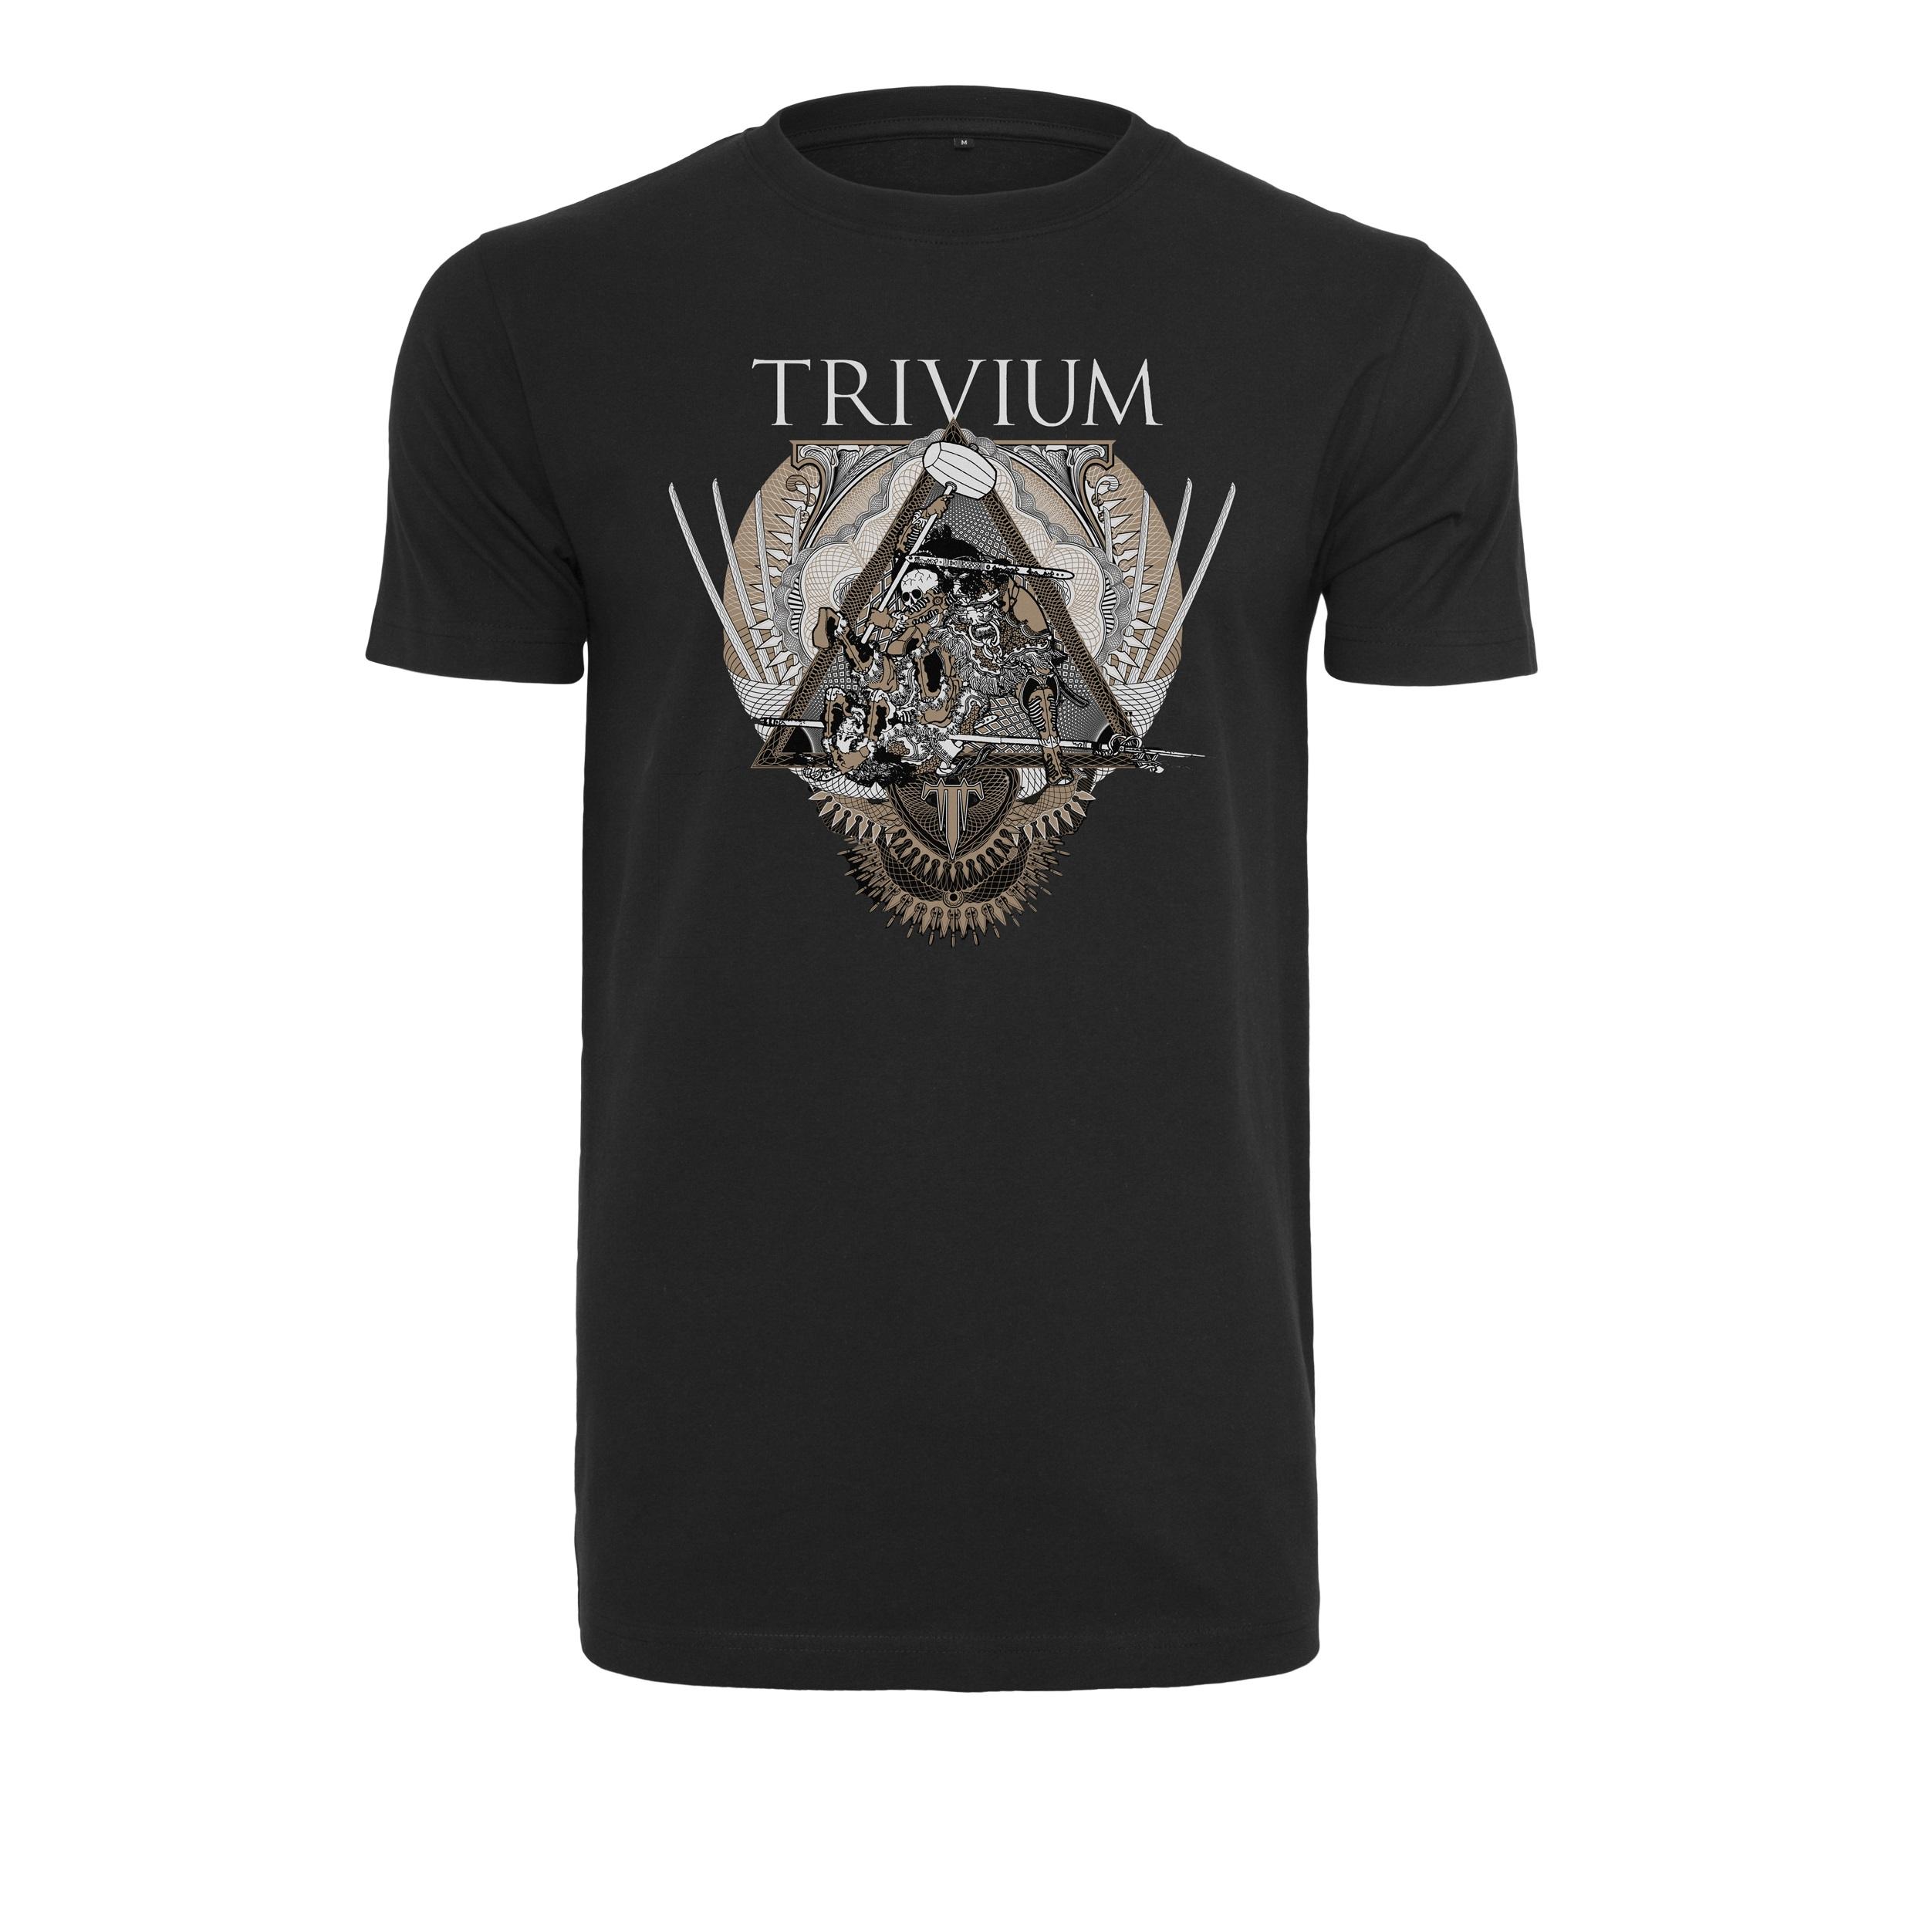 Trivium - Tričko Triangular war tee - Muž, Čierna, XXL